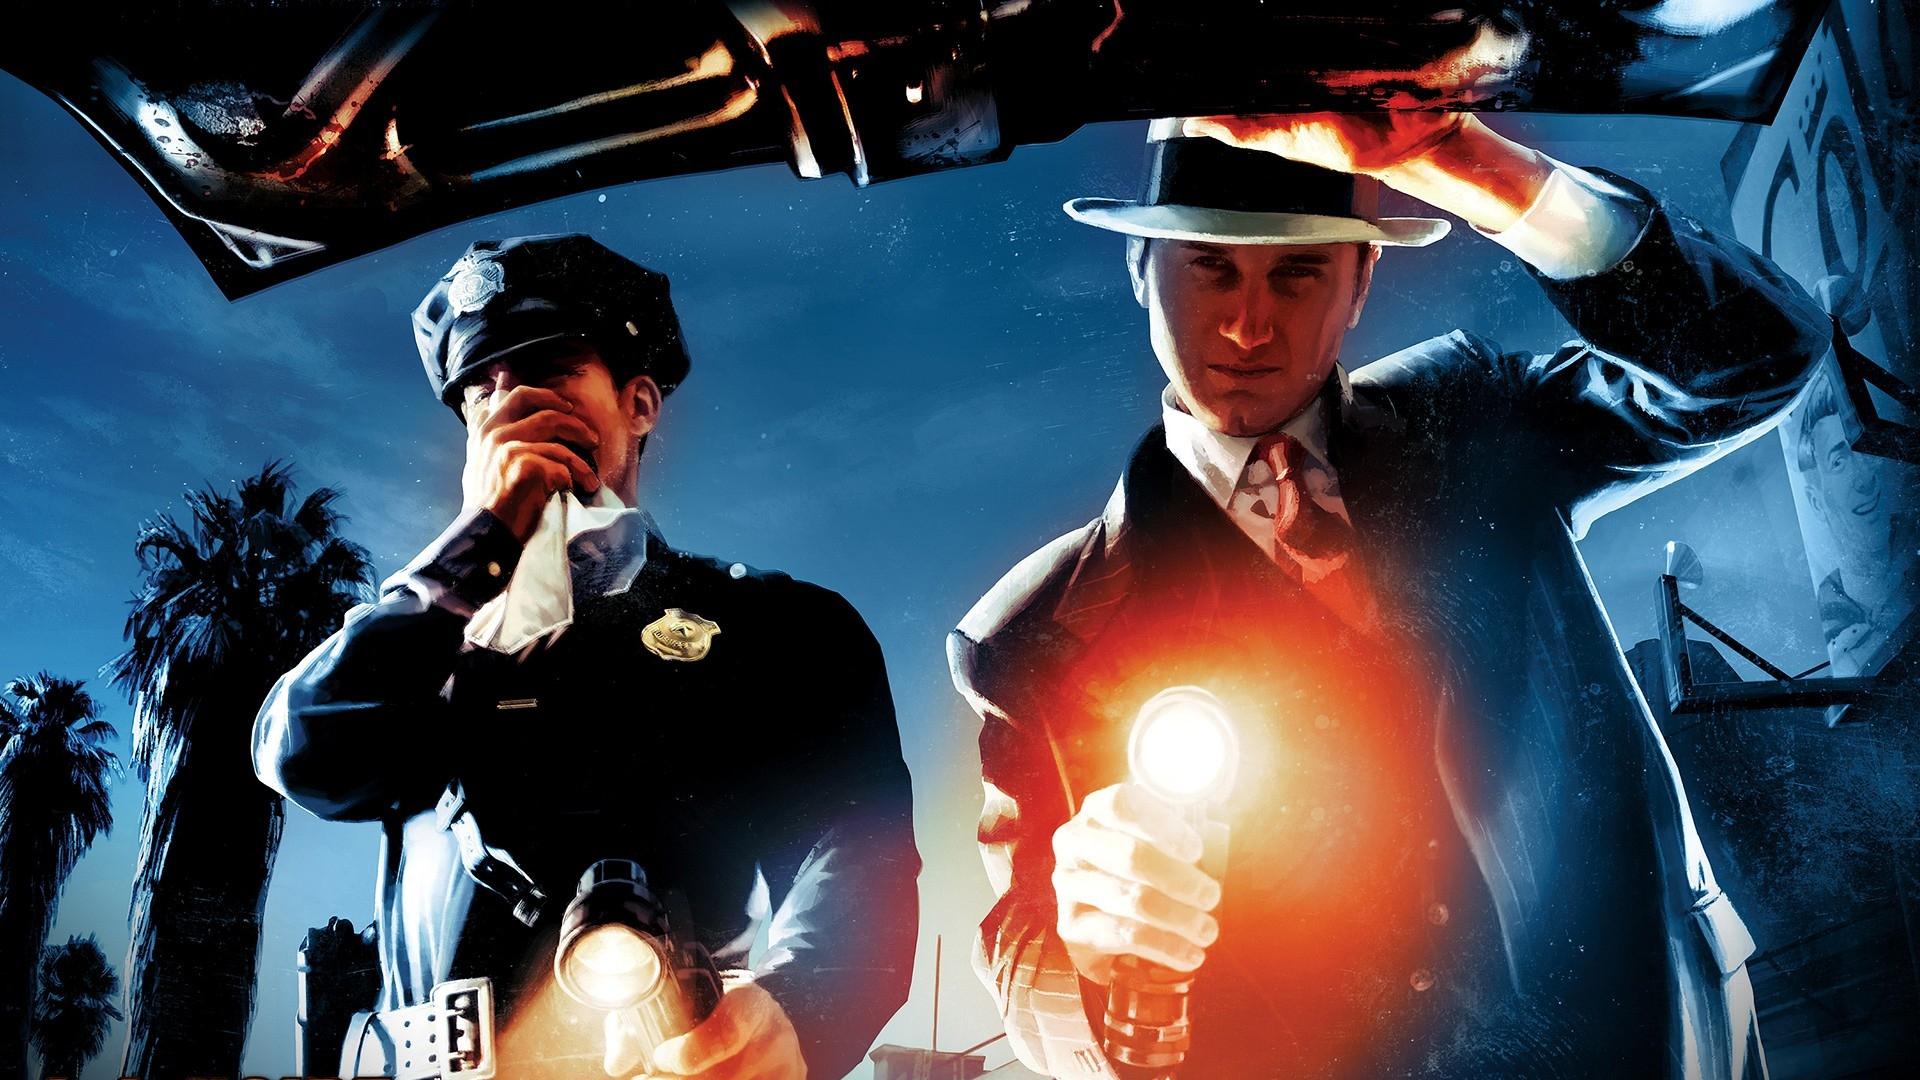 la_noire_police_light_luggage_rack_street_21175_1920x1080